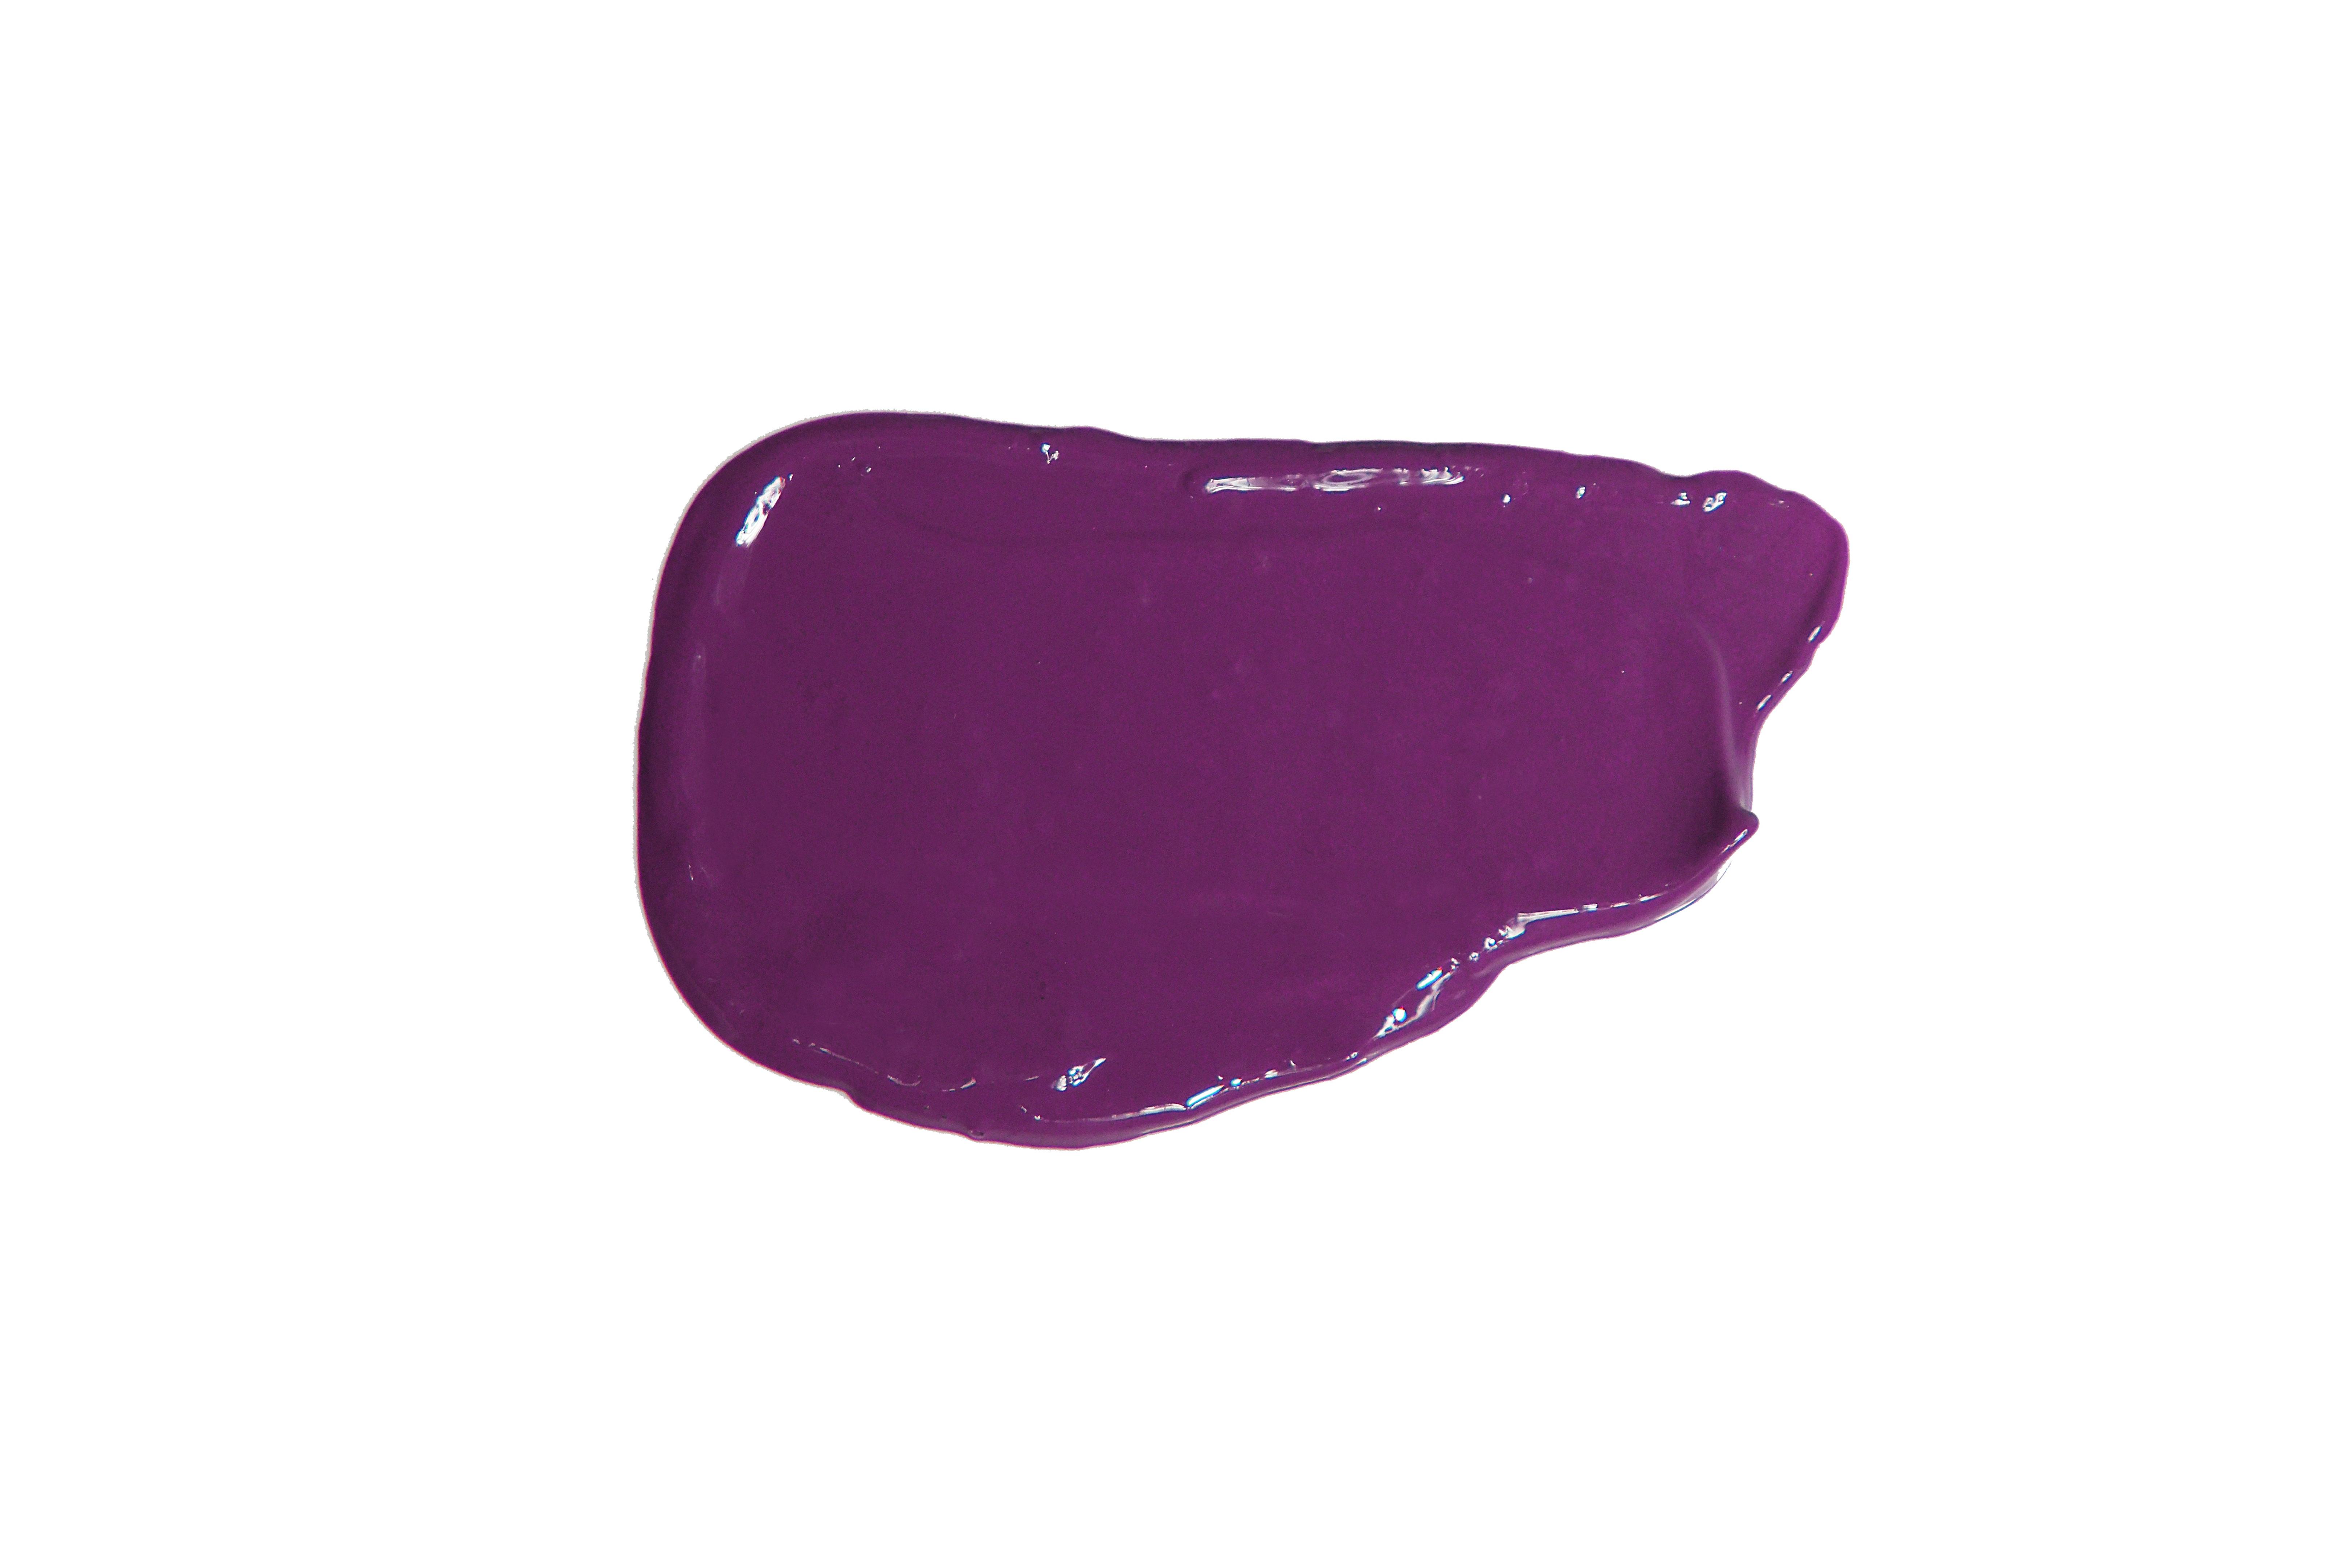 Fotos gratis : púrpura, pétalo, corazón, rosado, maquillaje ...